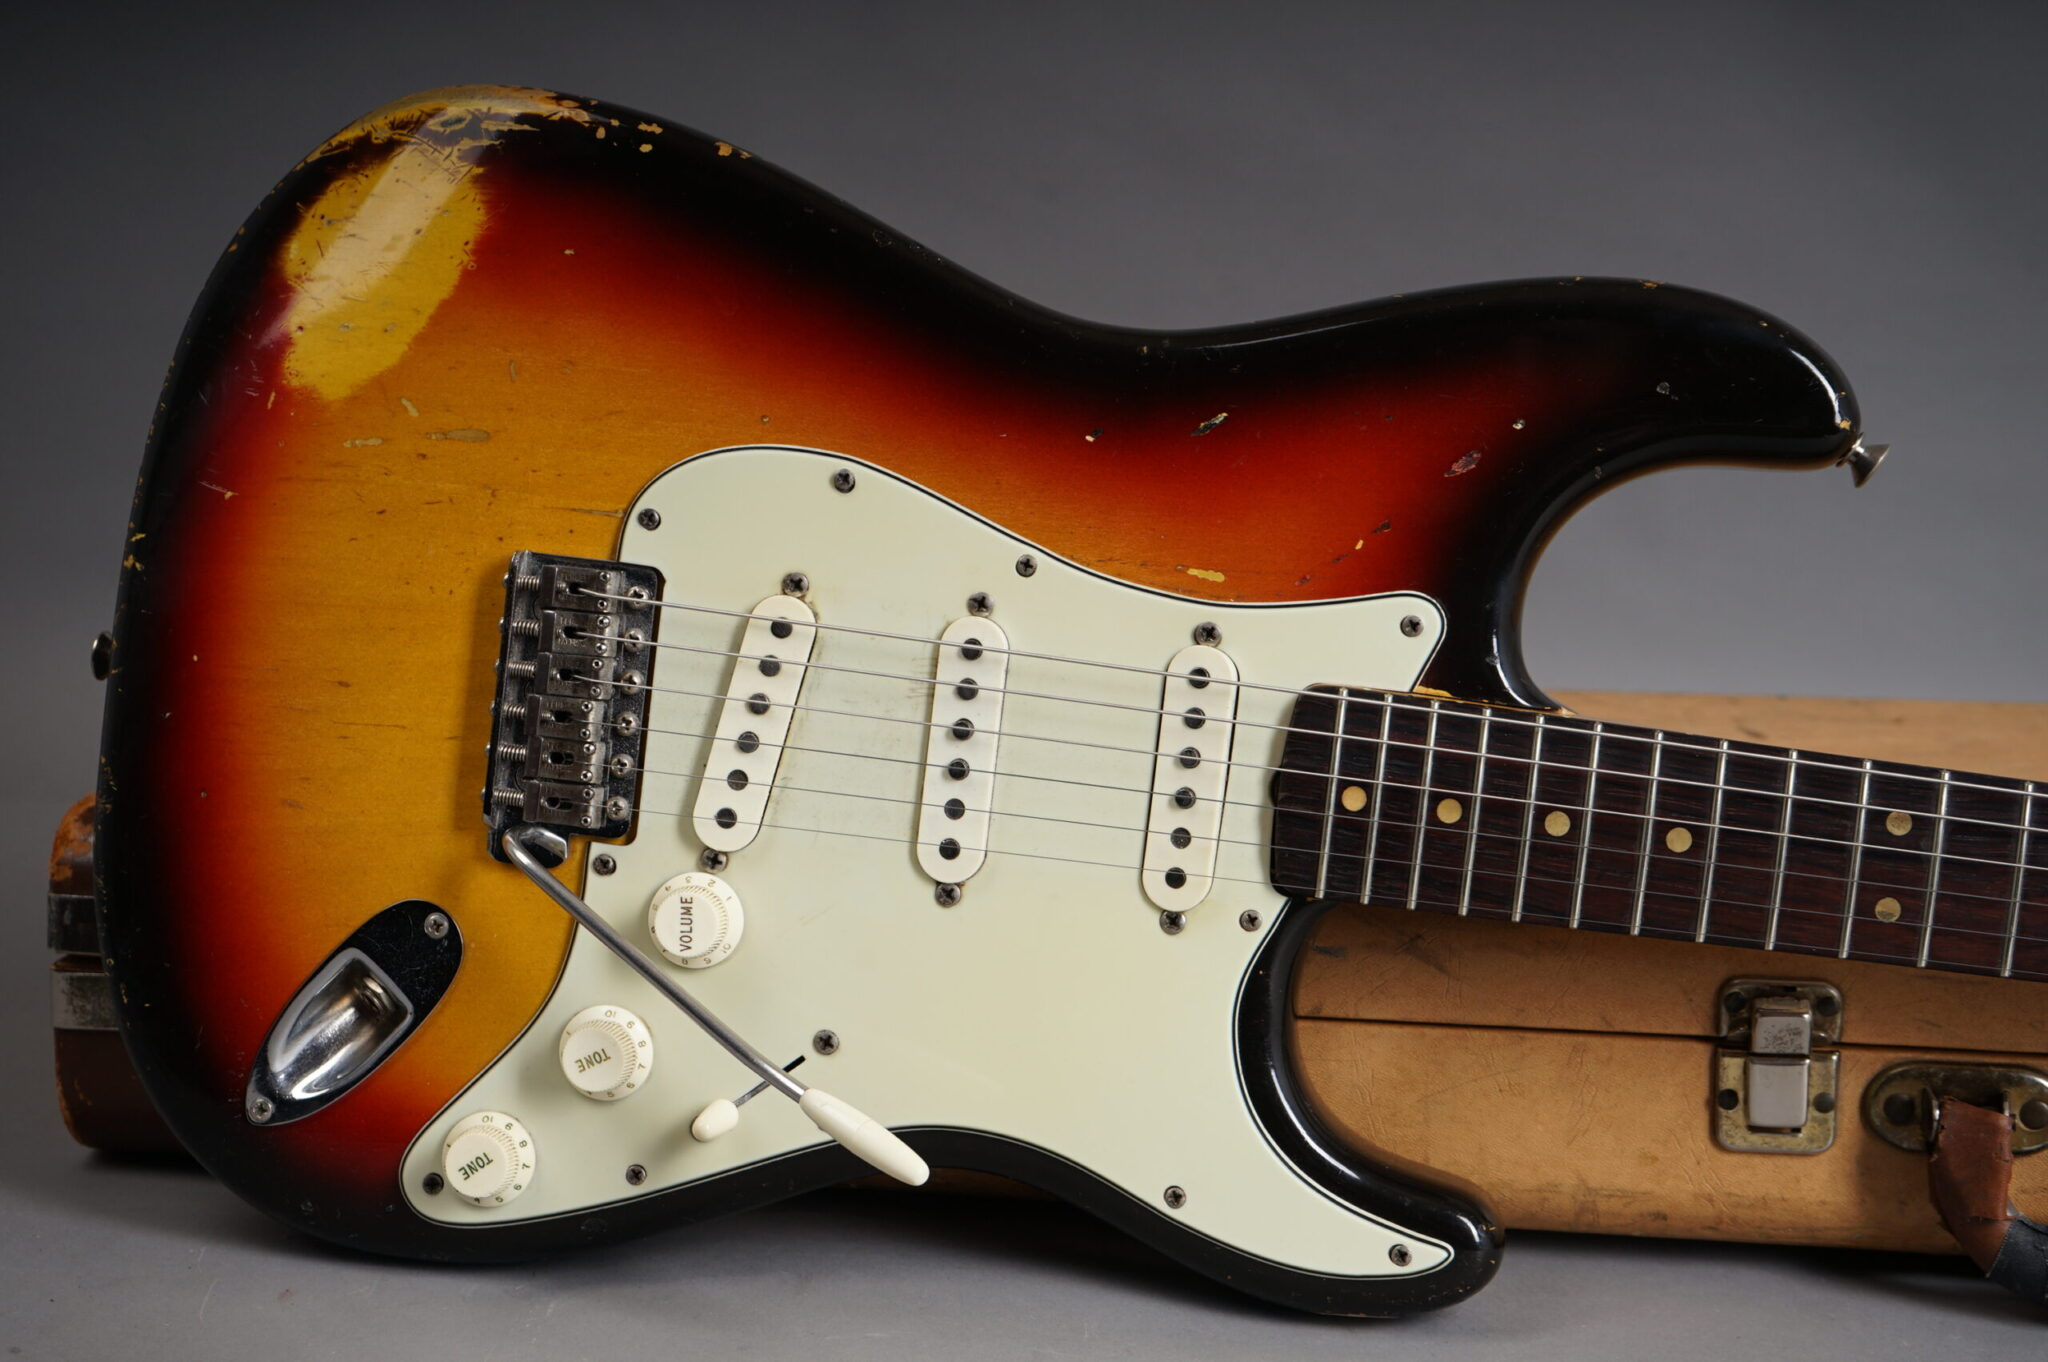 https://guitarpoint.de/app/uploads/products/1964-fender-stratocaster-3-tone-sunburst-abigail-yabbara-pus/1964-Fender-Stratocaster-Sunburst-L39659-9-scaled-2048x1362.jpg